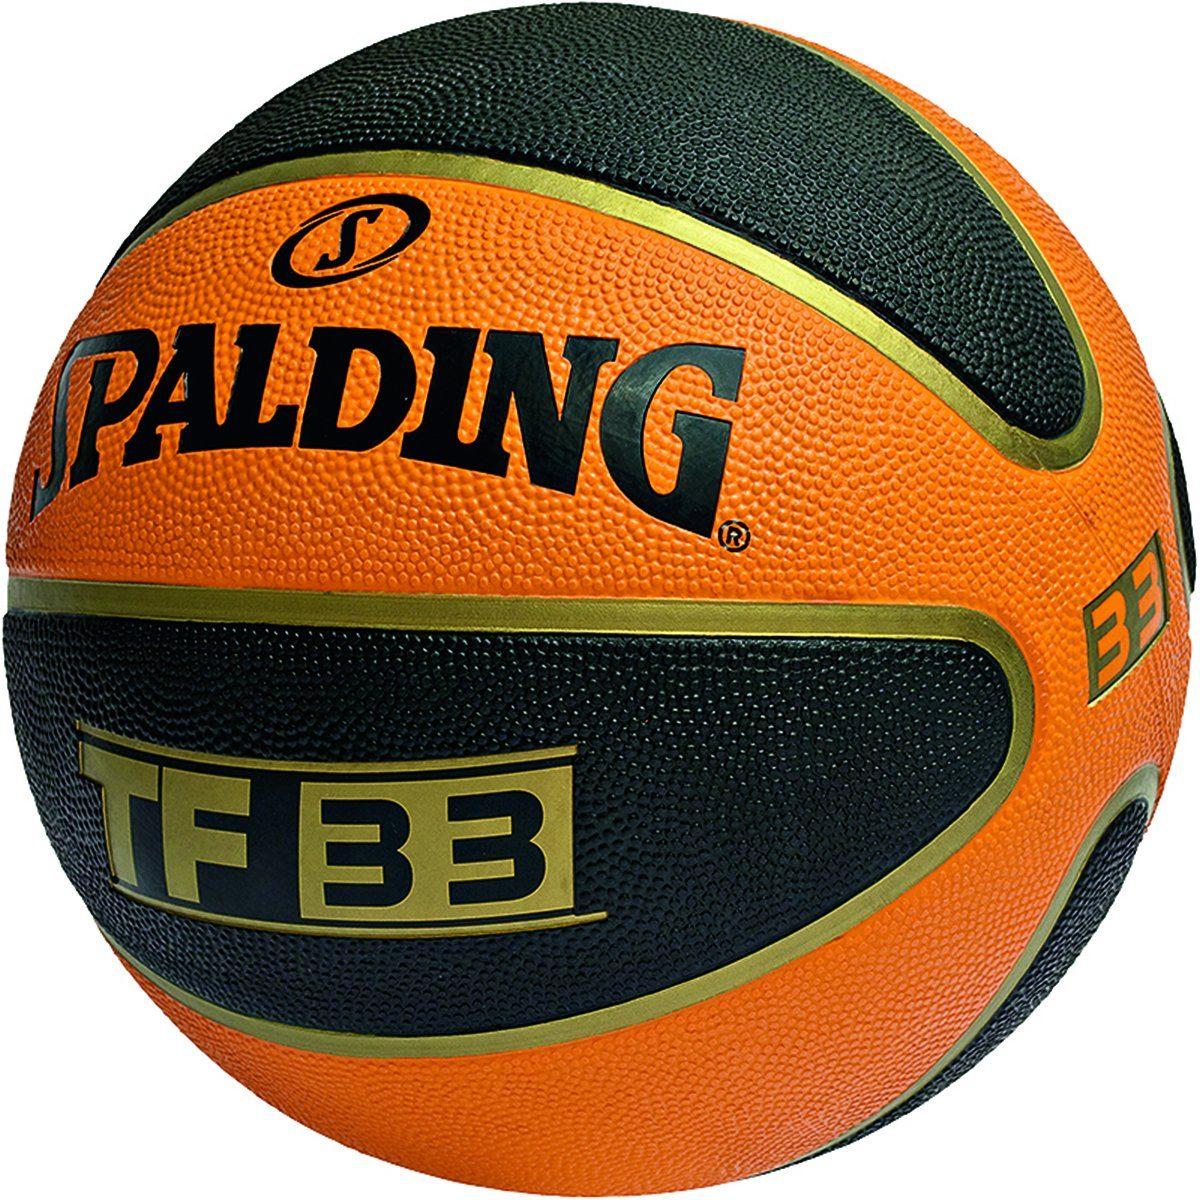 SPALDING TF 33 Outdoor Basketball